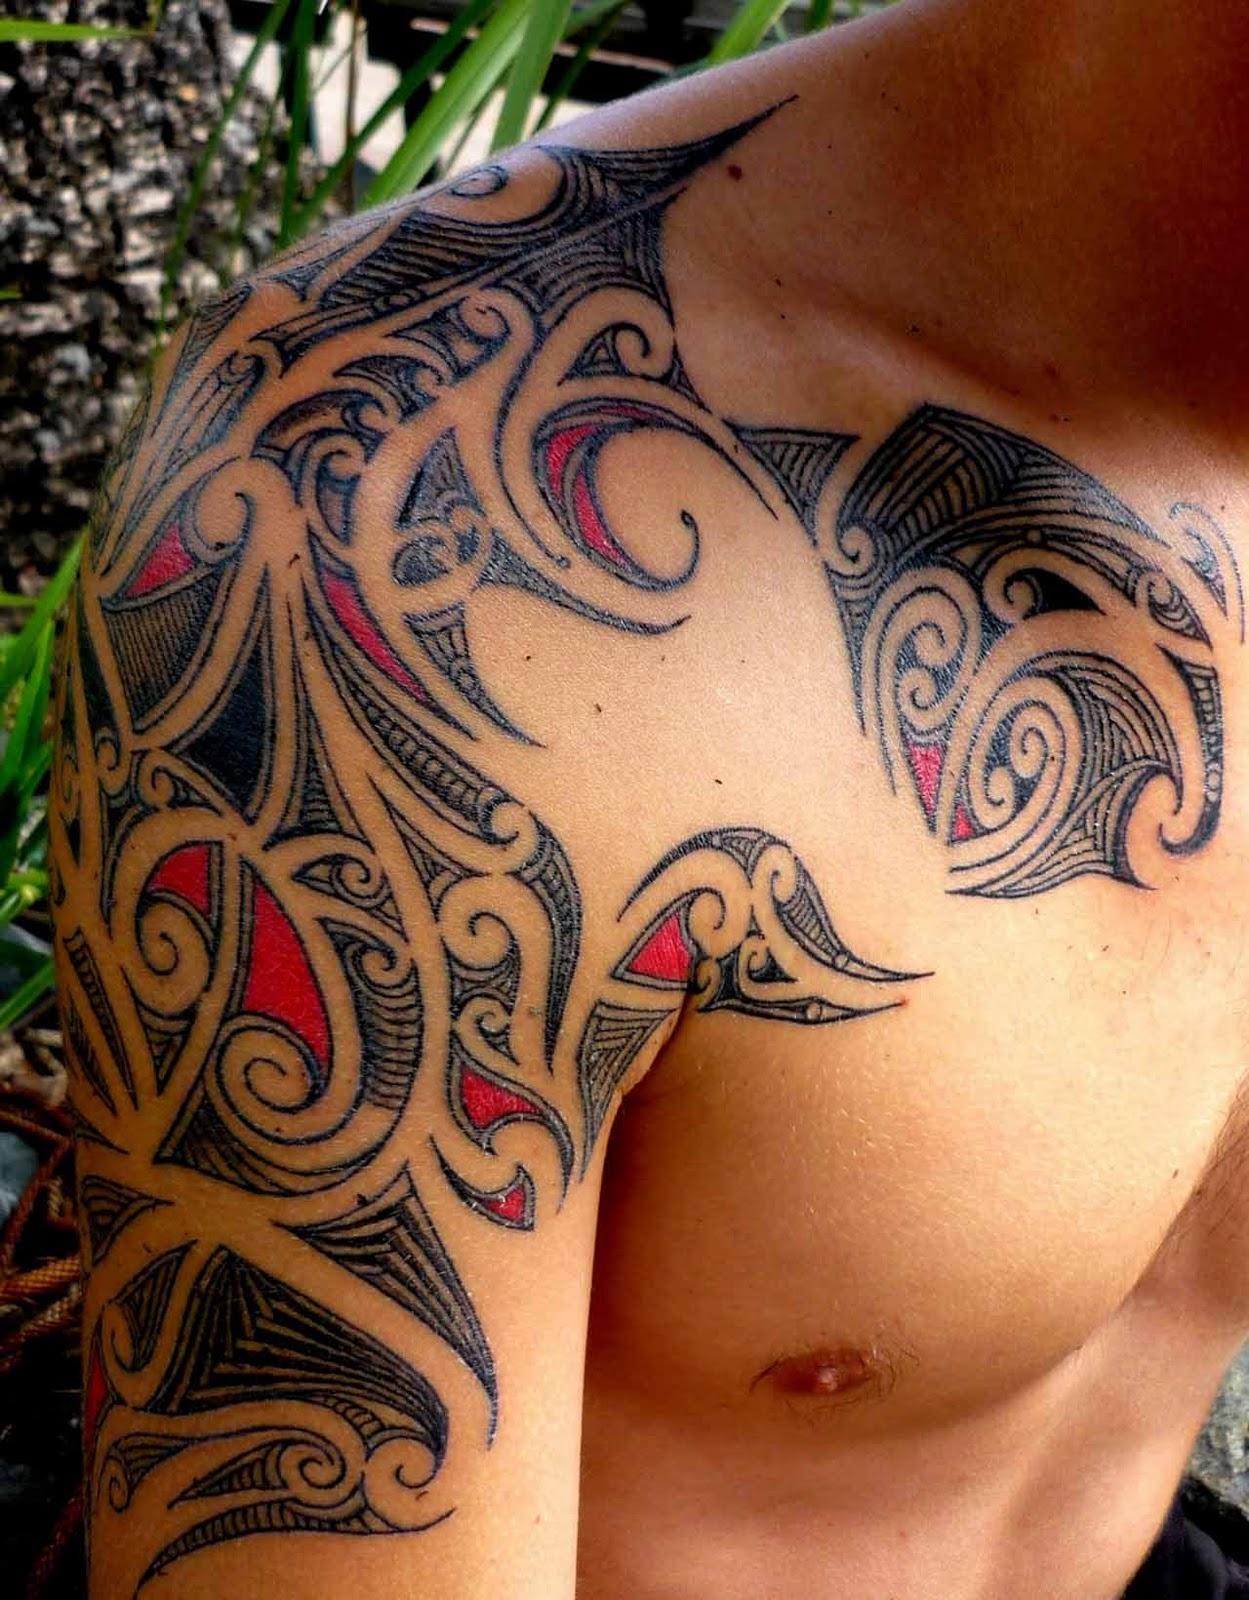 Tatuajes Tribales : Tatuaje Tribal en el hombro en negro y rojo